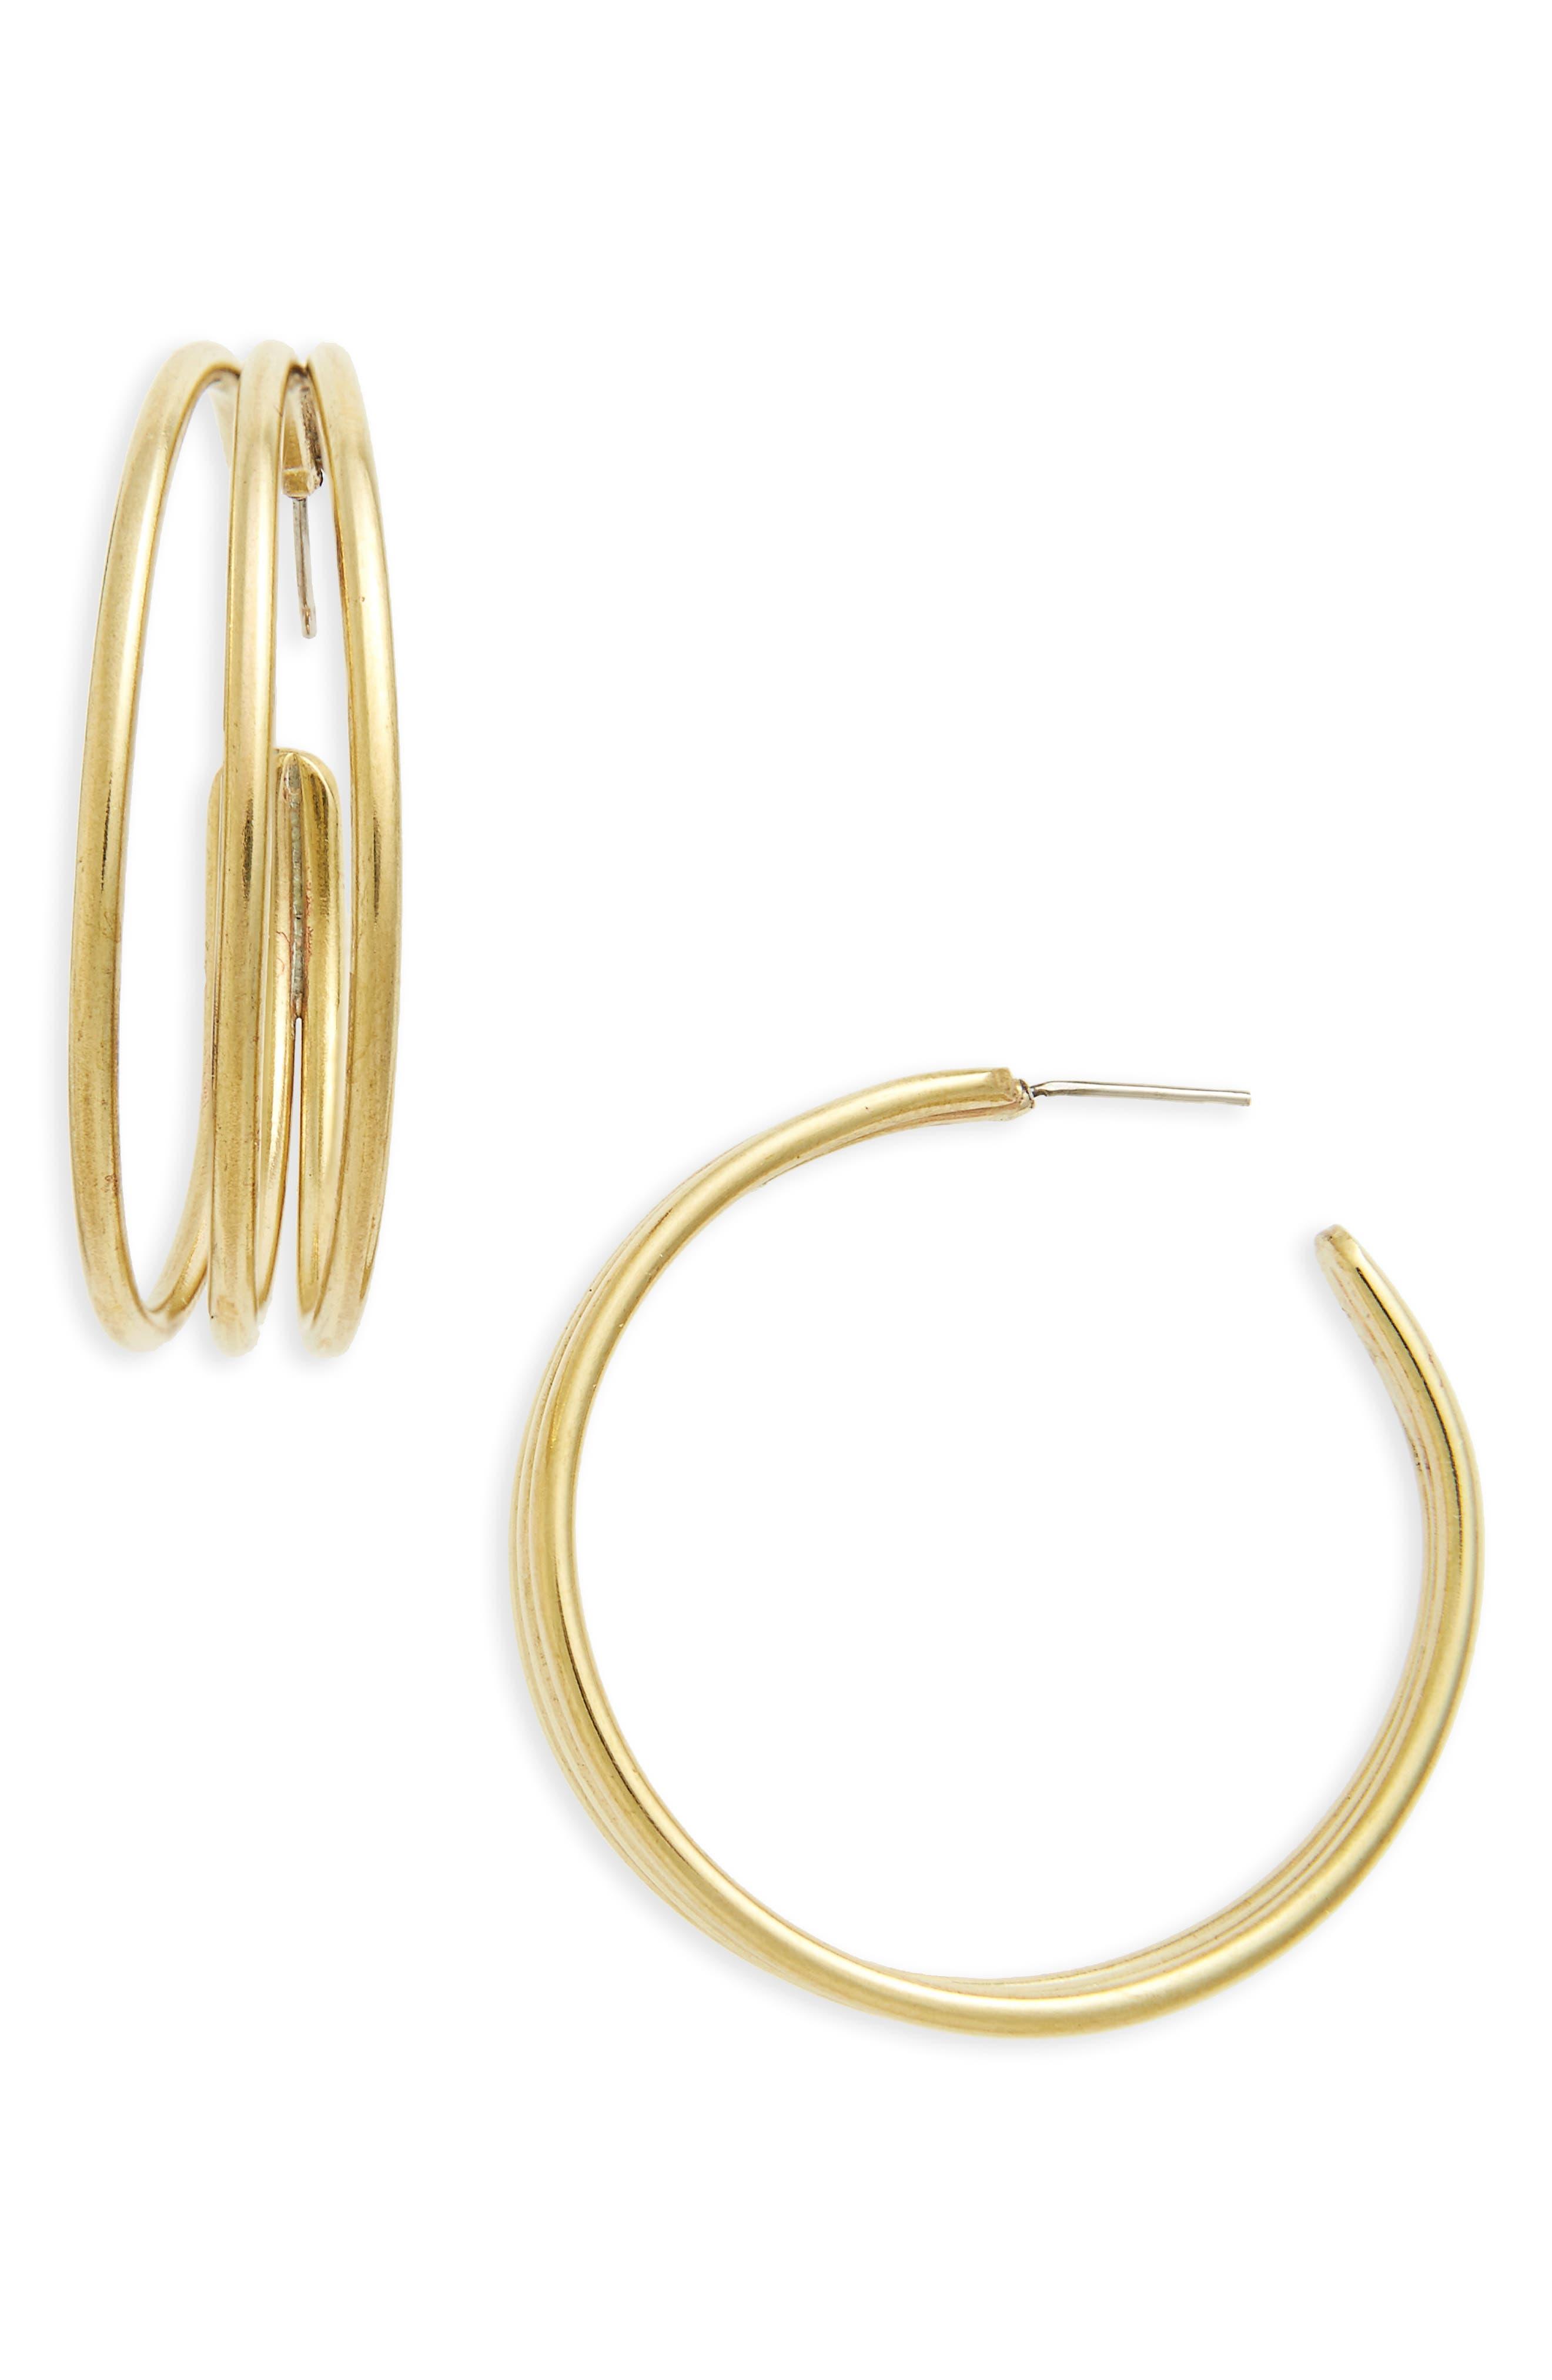 Main Image - Soko Triple Band Hoop Earrings